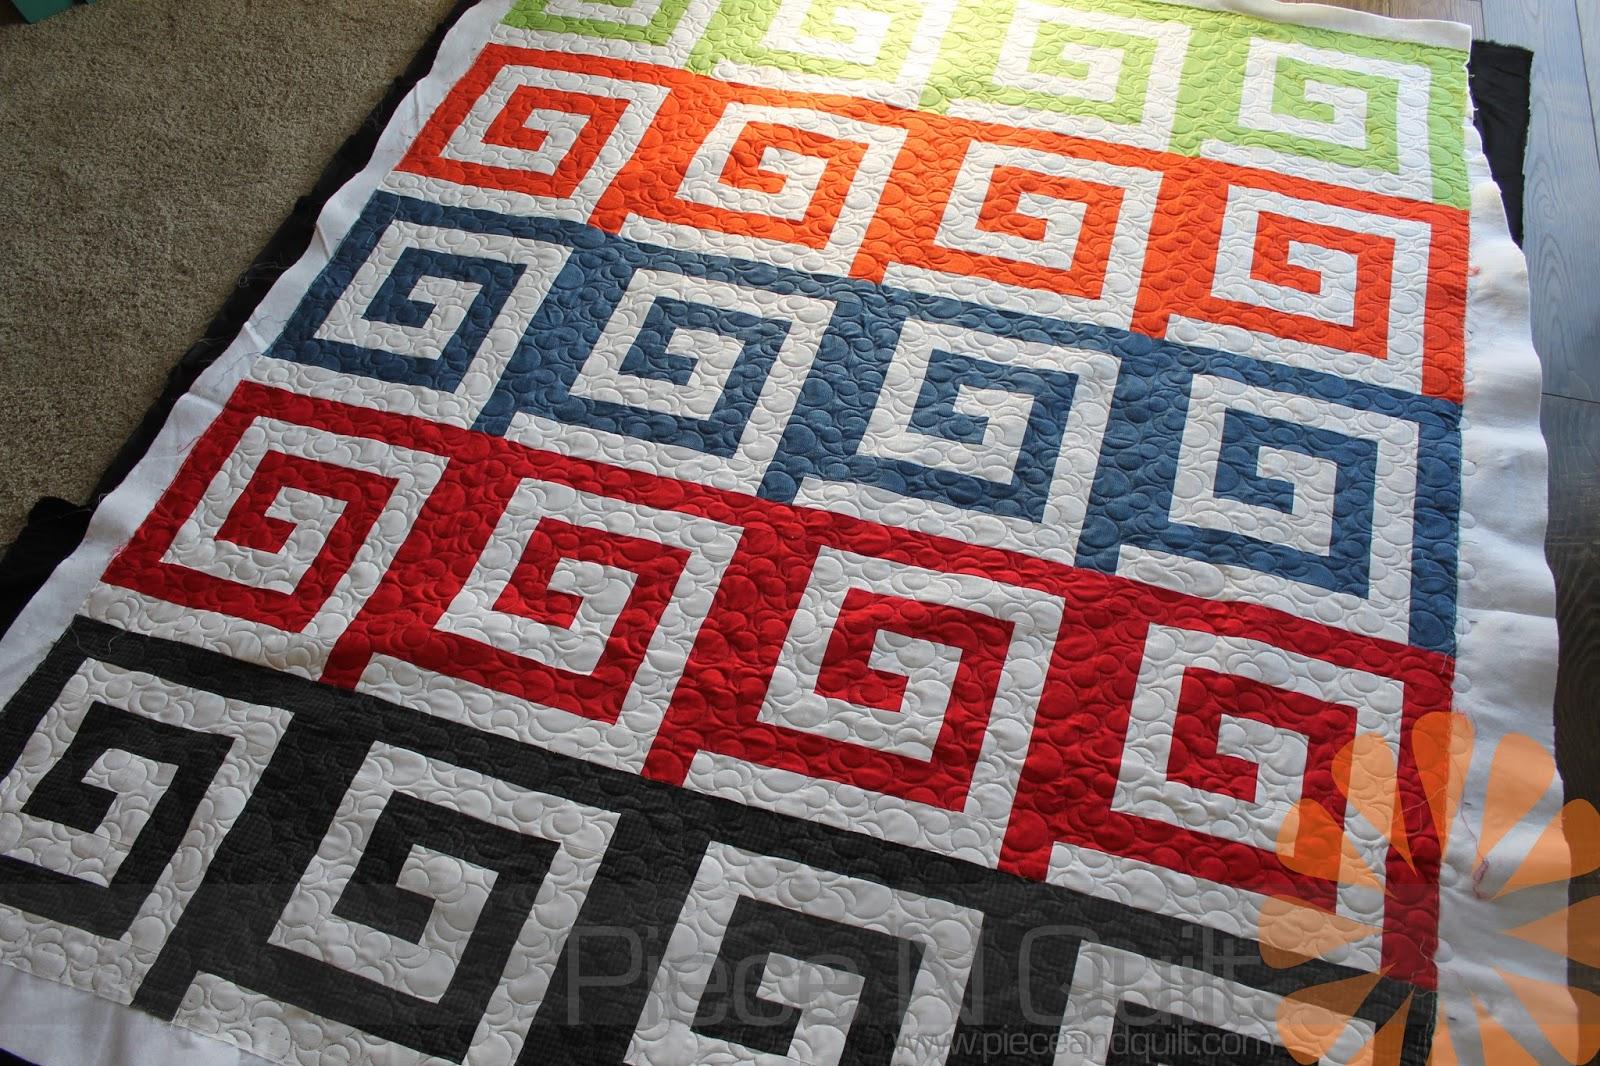 Piece N Quilt: Twisty - Modern One-Block Quilts : one block quilt - Adamdwight.com